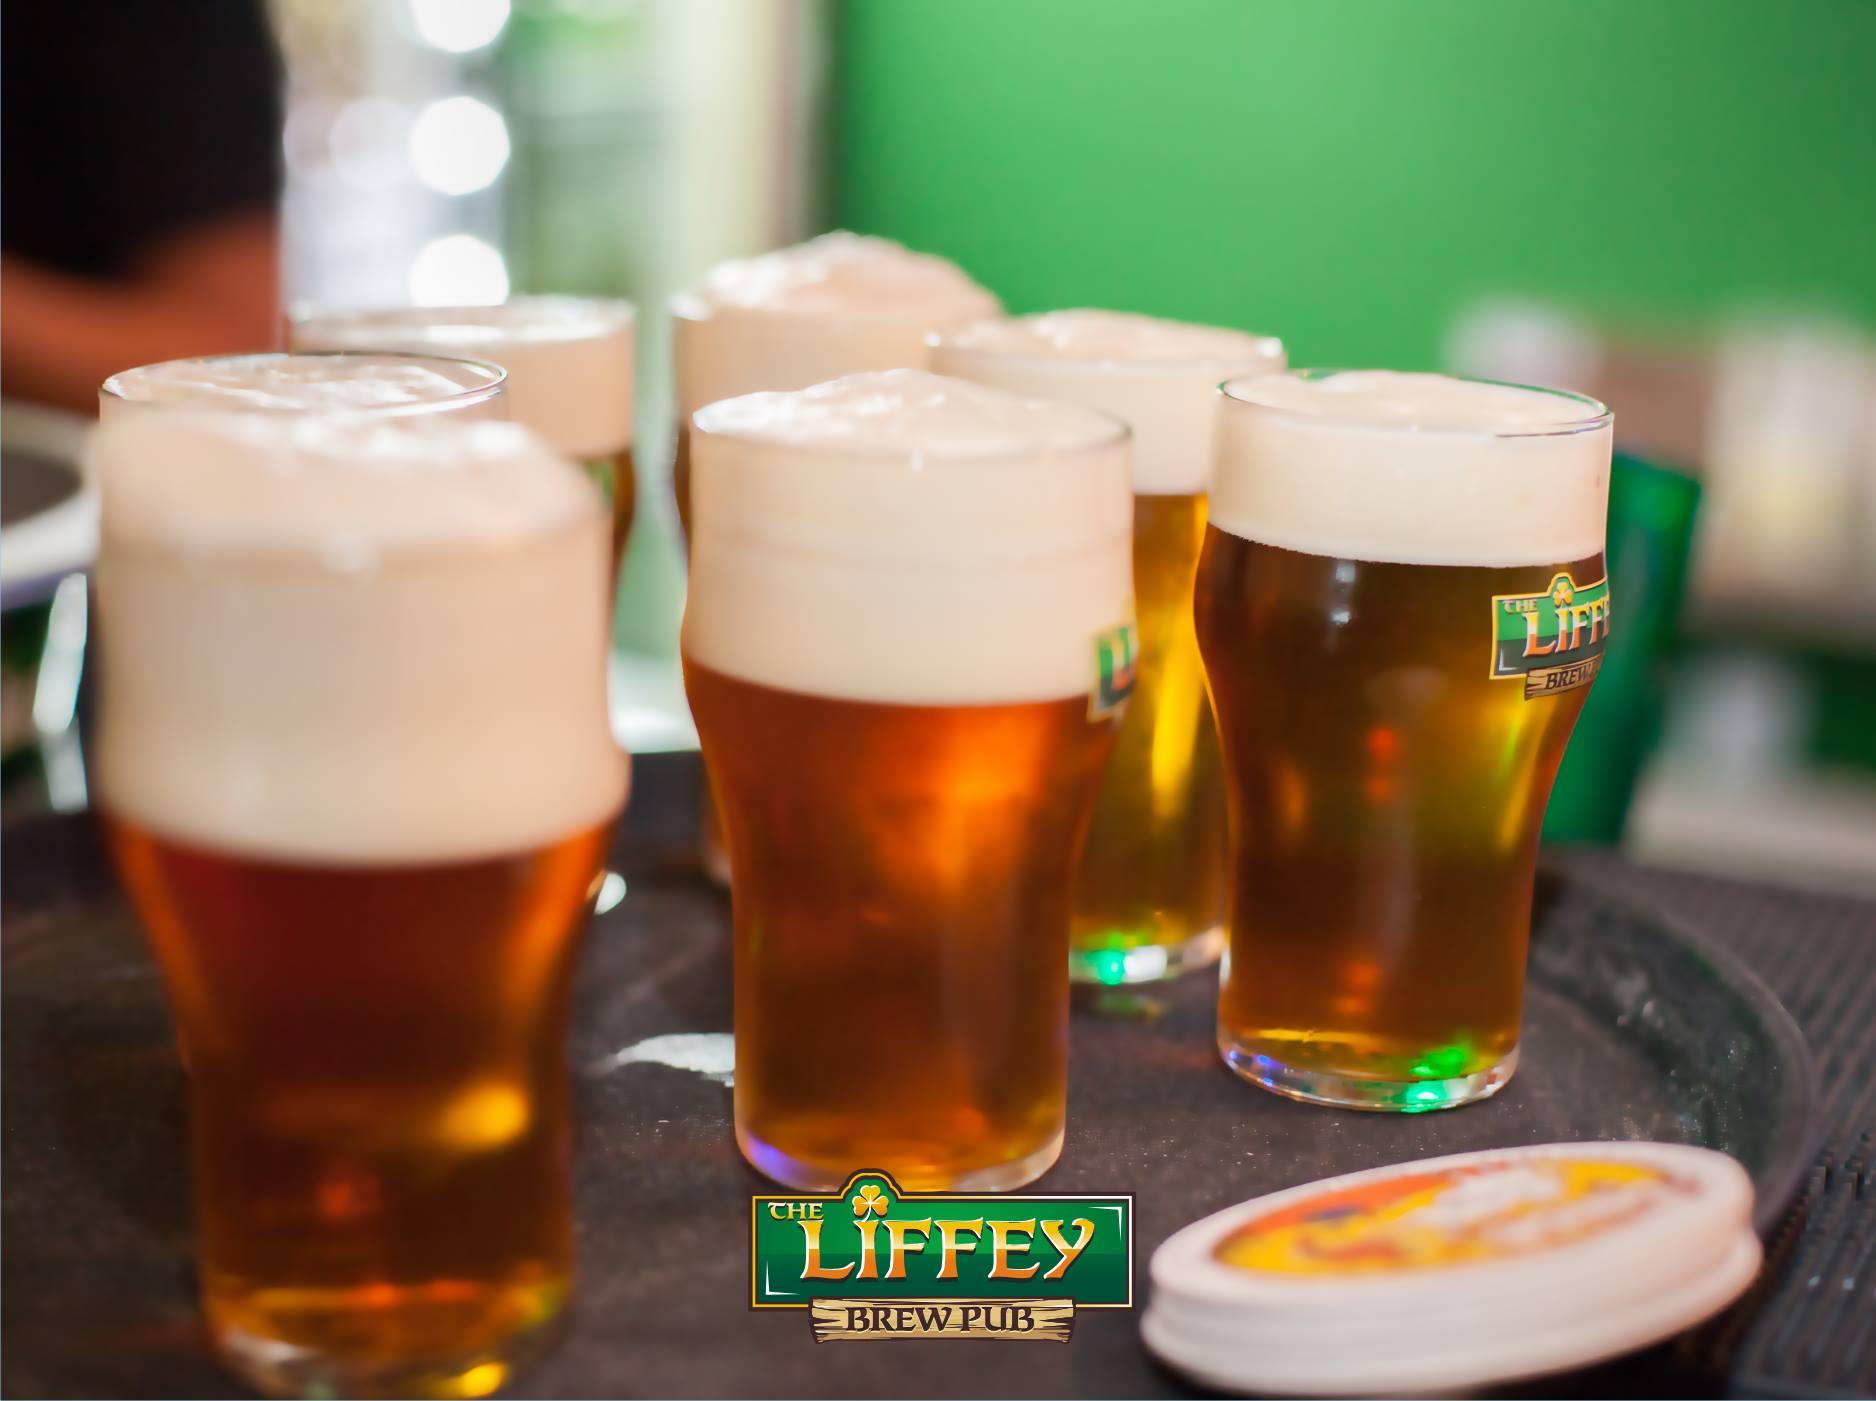 The-Liffey-Brew-Pub